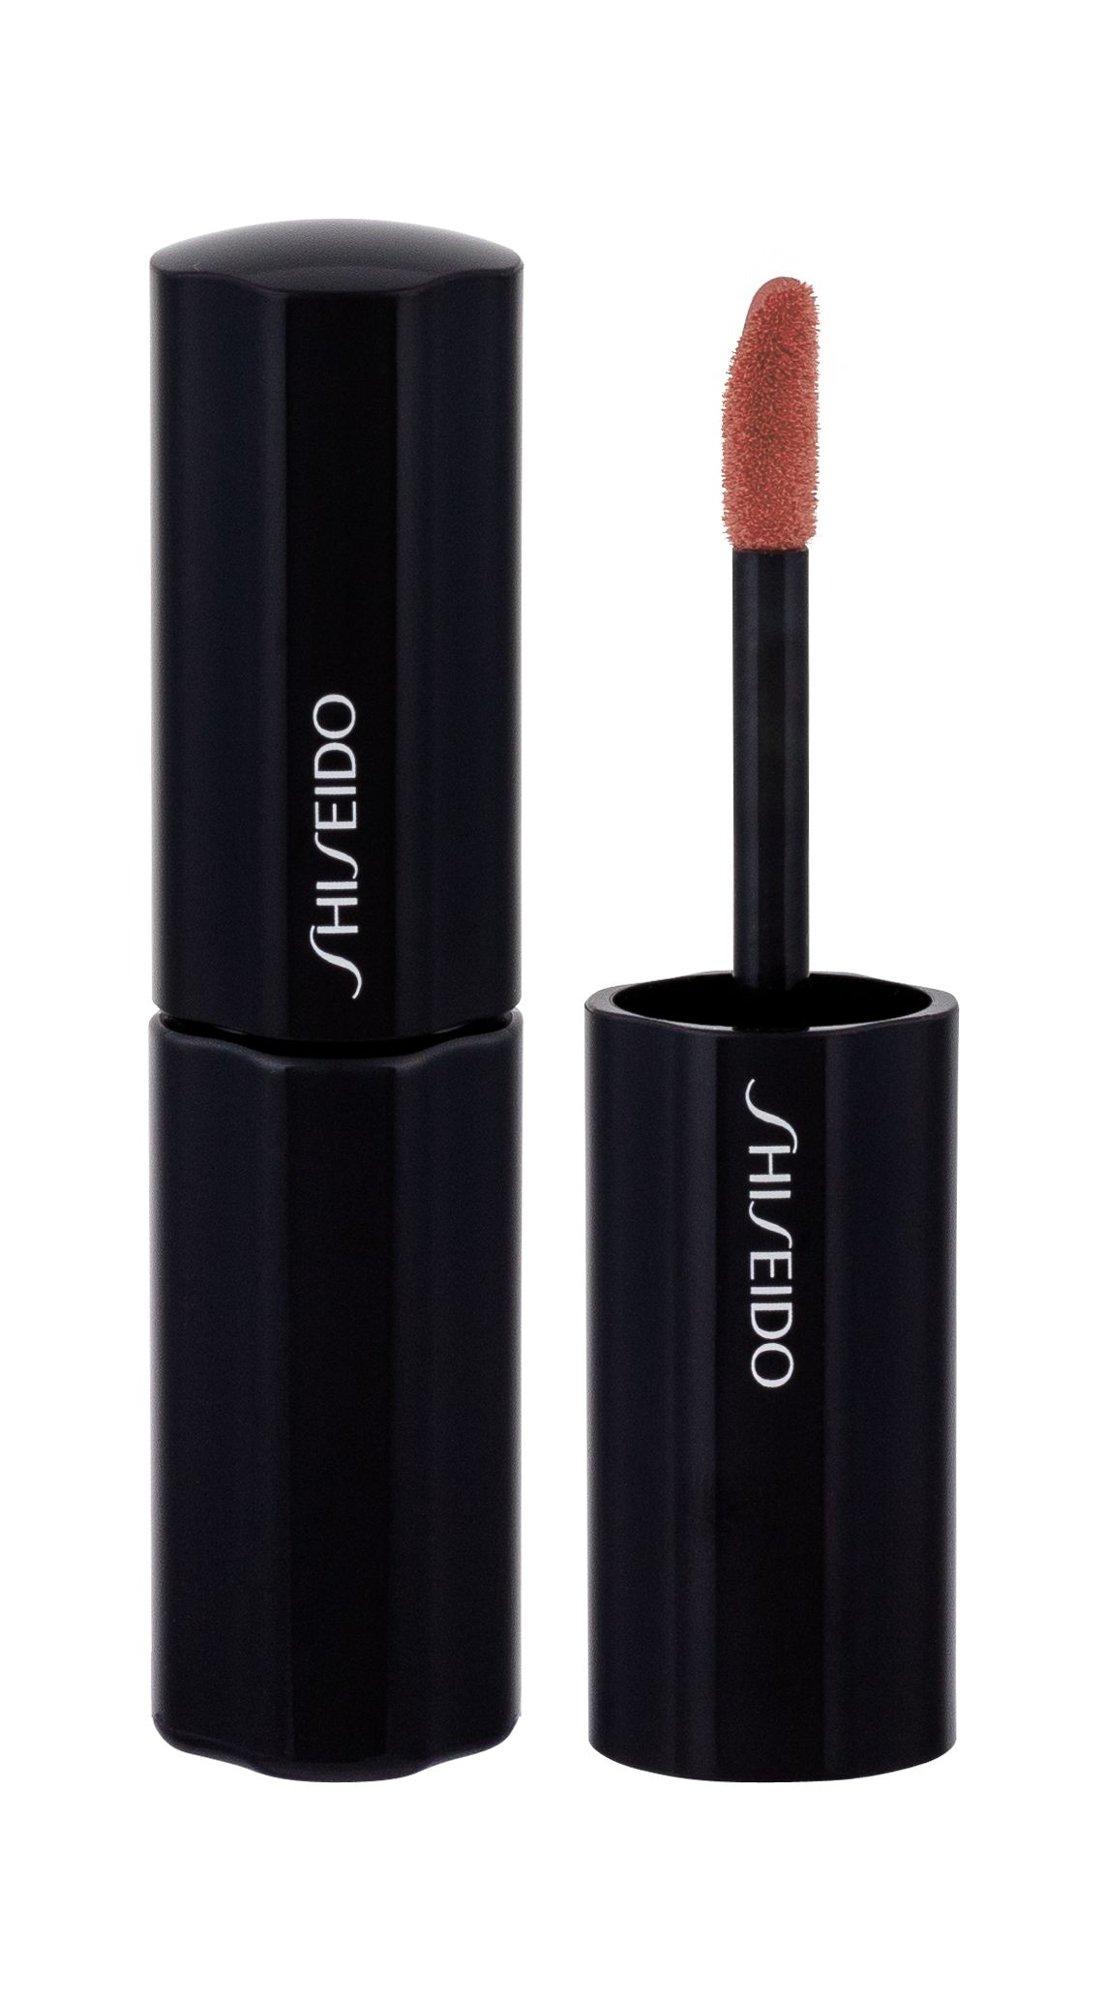 Shiseido Lacquer Rouge Lipstick 6ml RD203